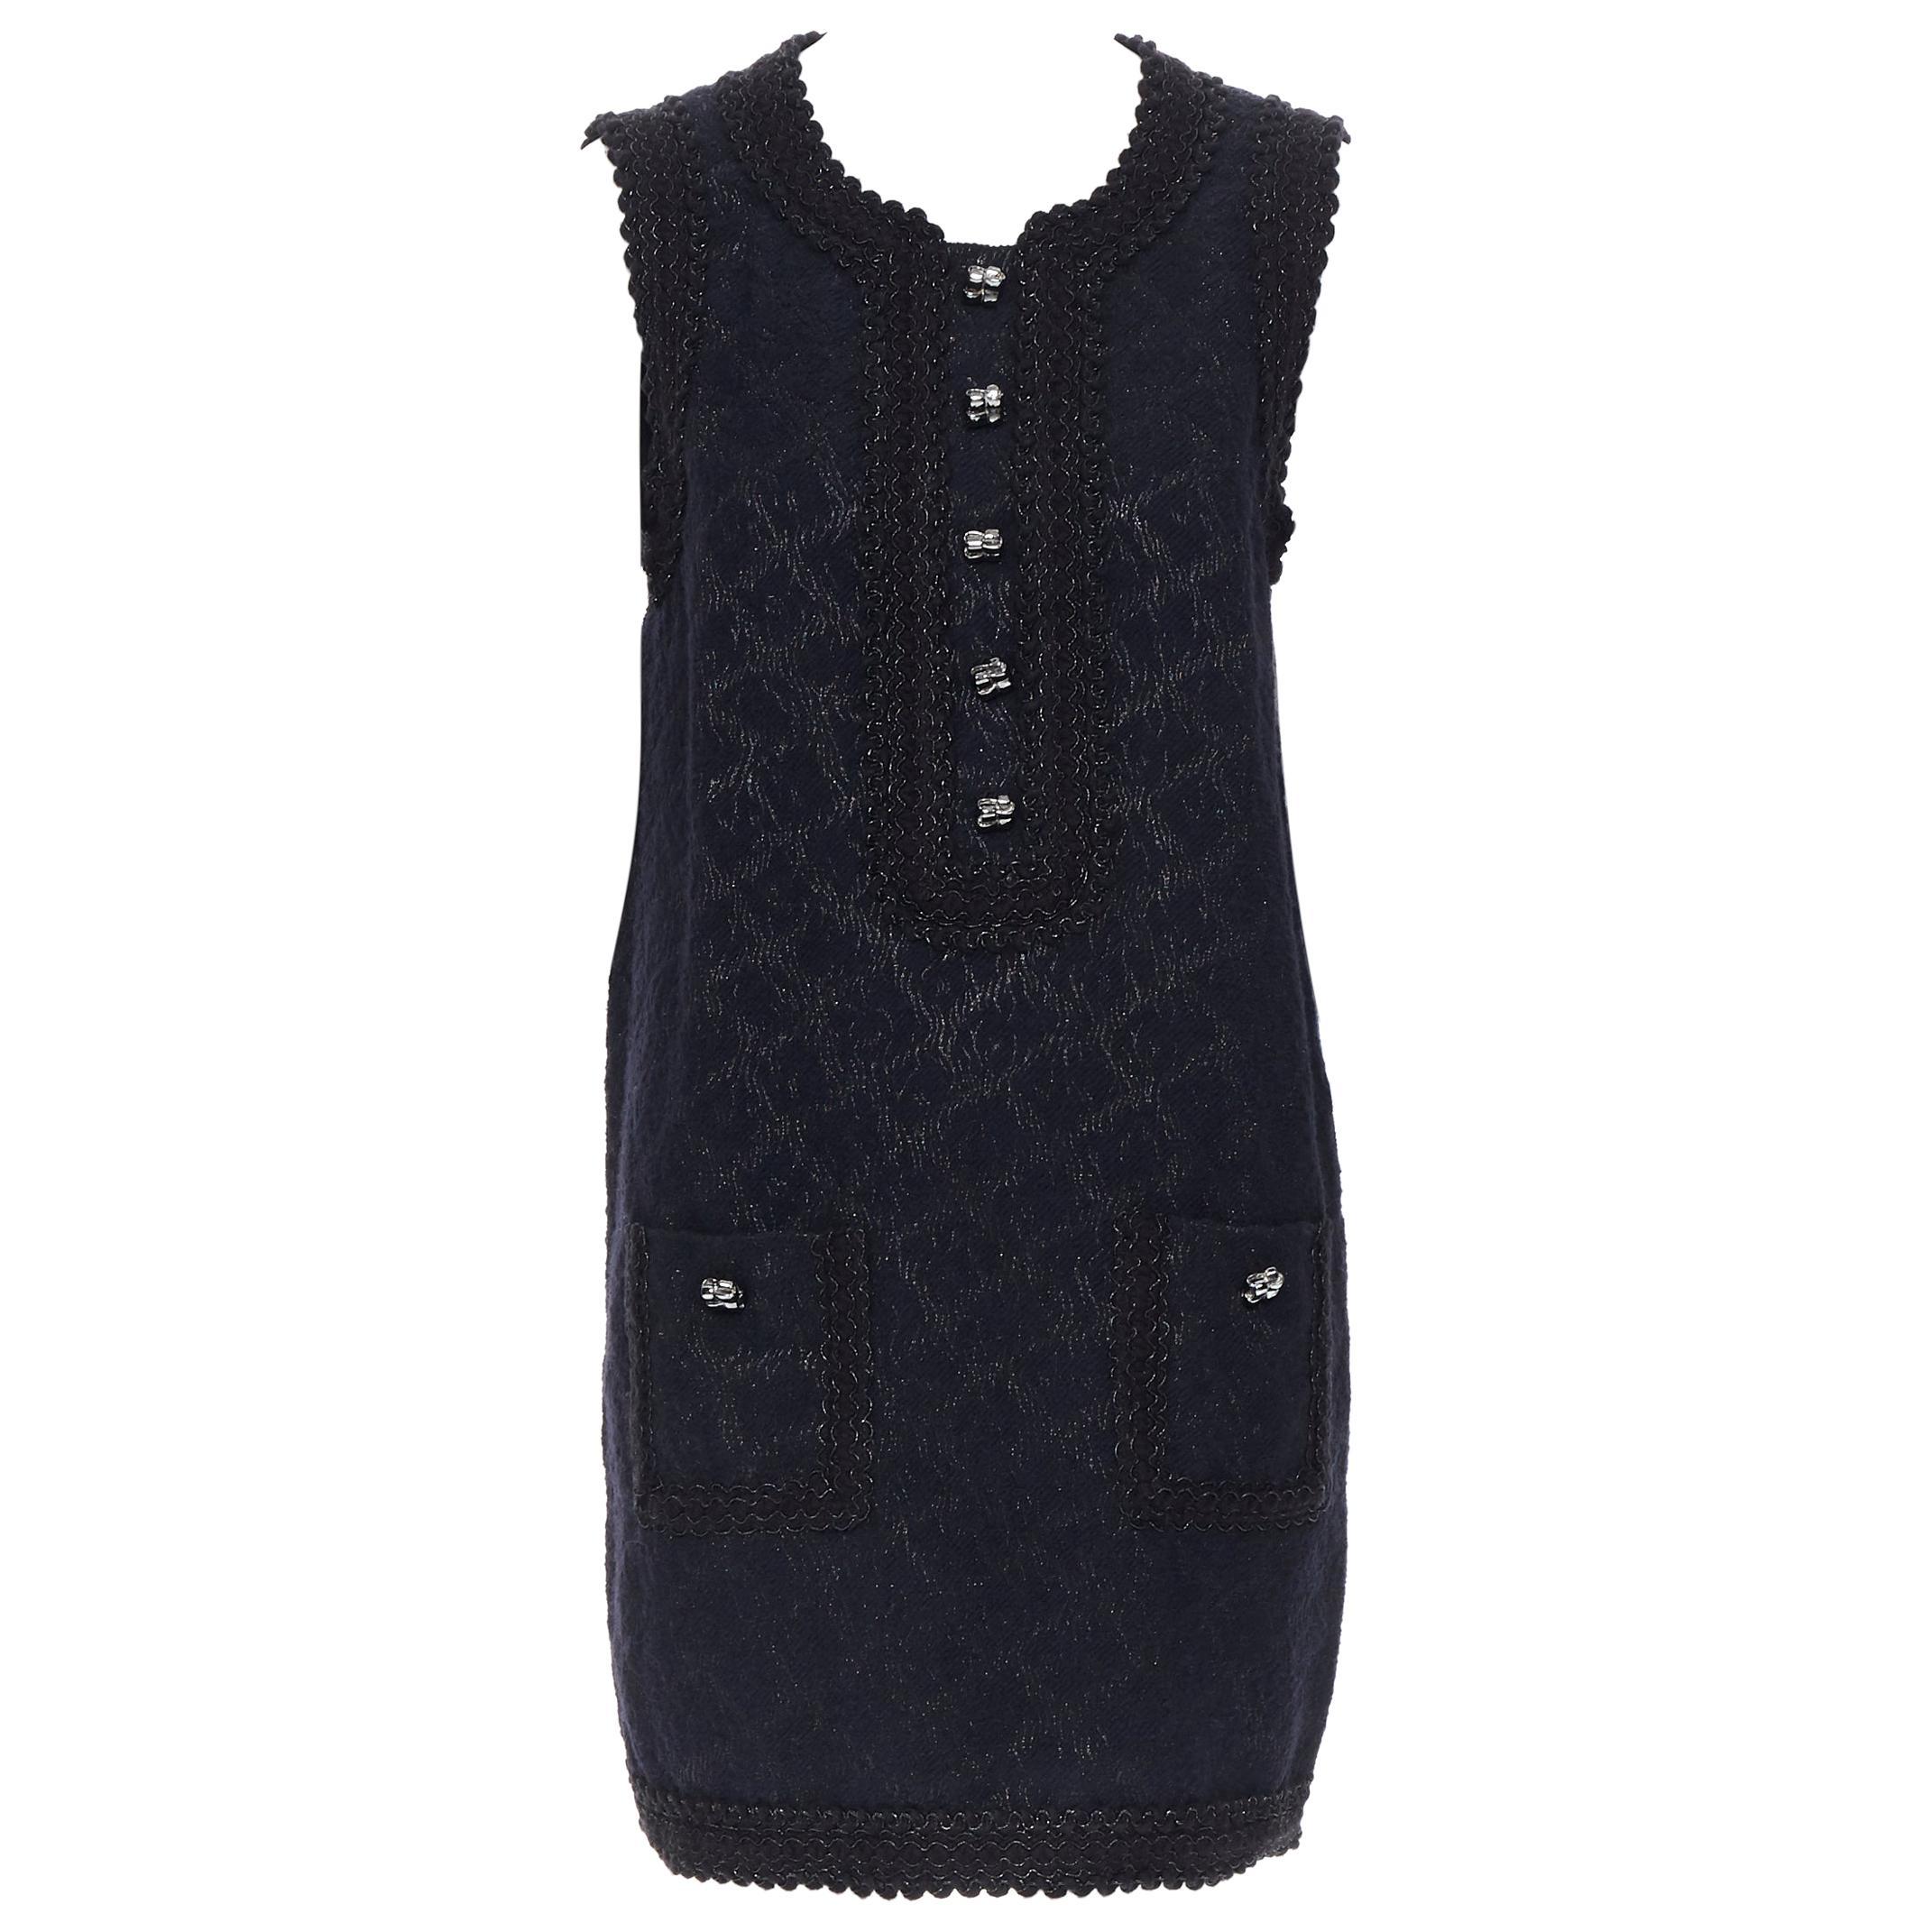 ANDREW GN PF2010 black jacquard wool scalloped tweed trim sheath dress FR40